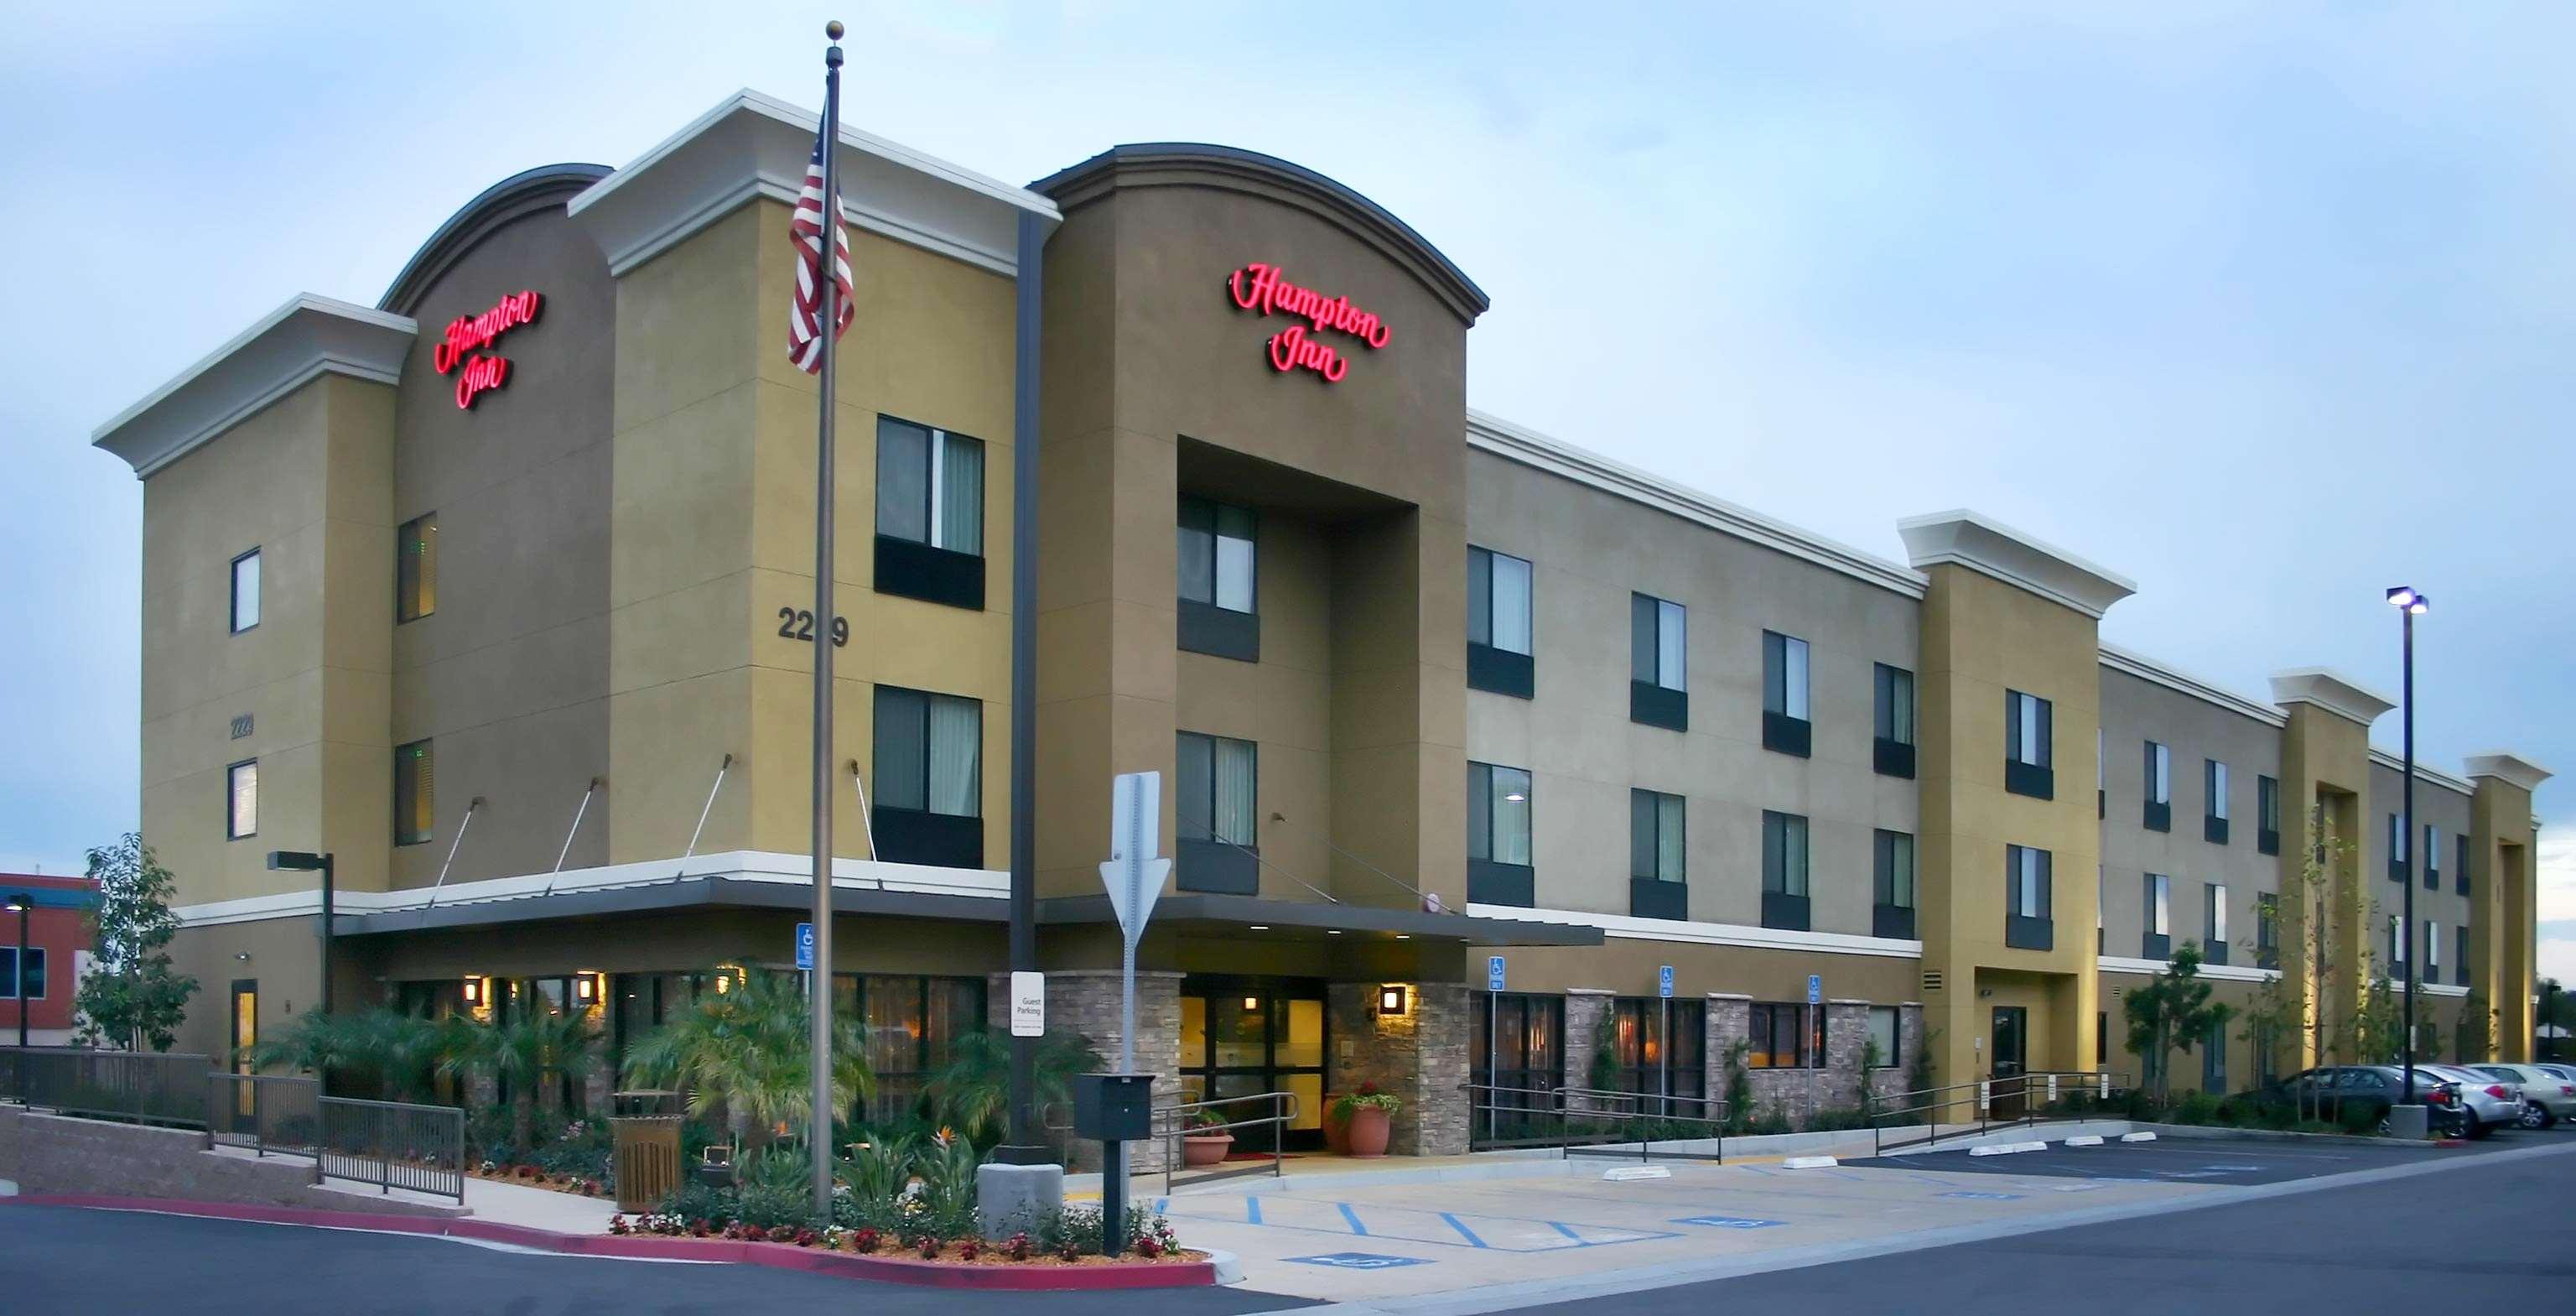 Hampton Inn Carlsbad-North San Diego County image 2